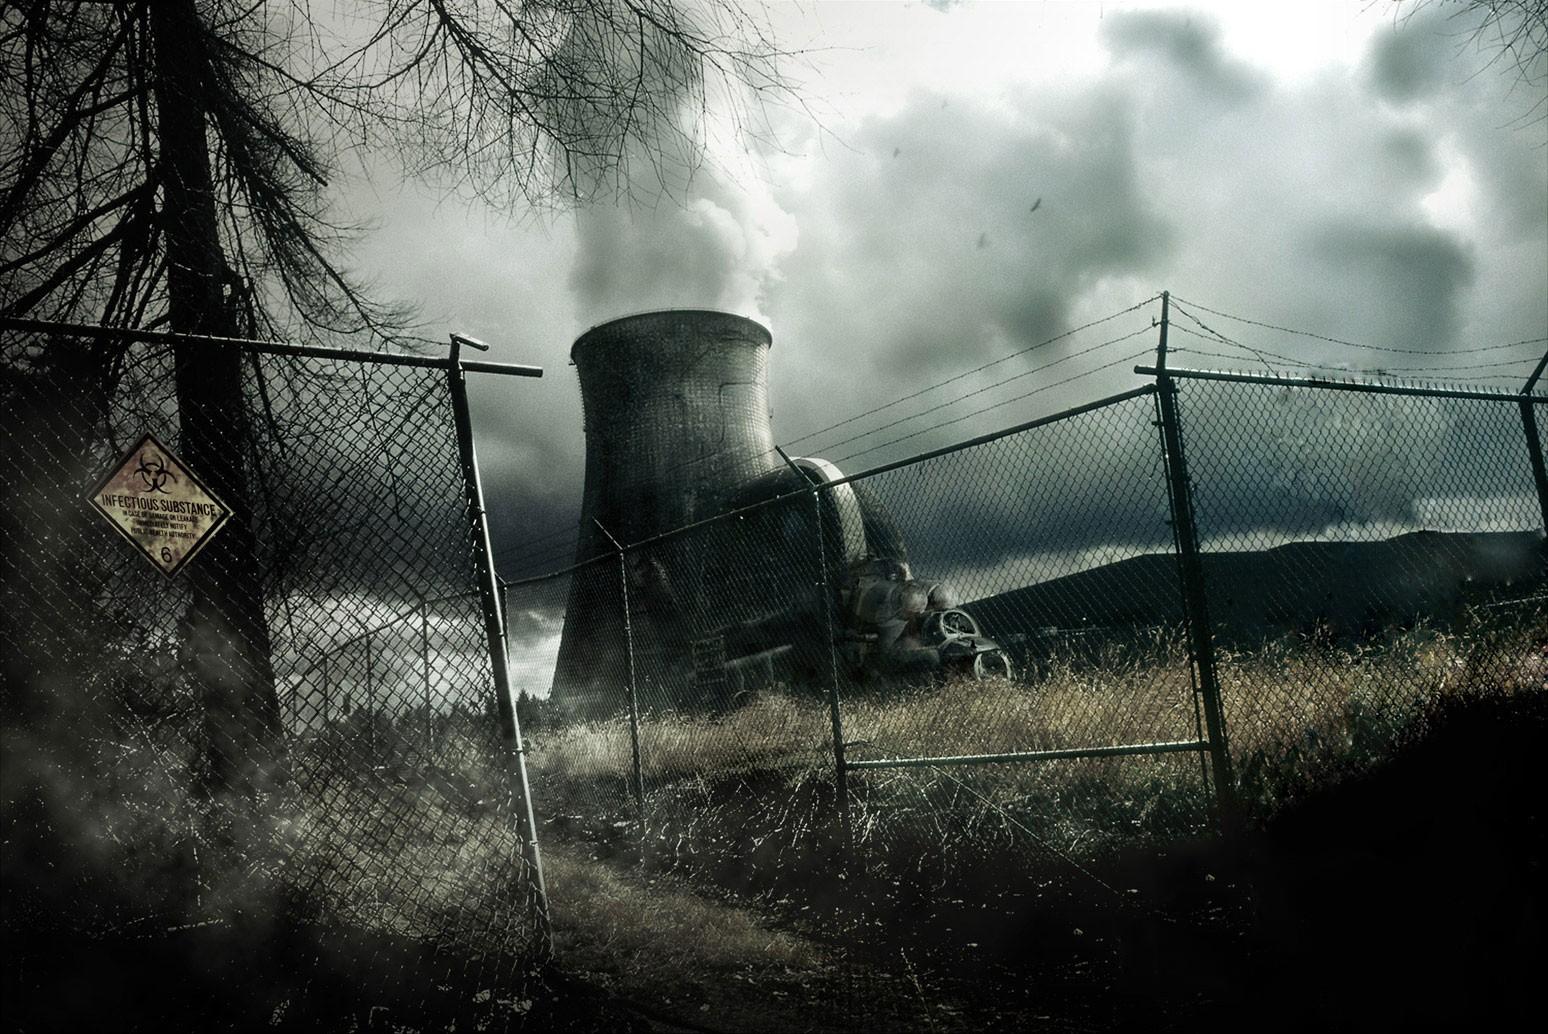 General 1548x1034 dystopian apocalyptic fence dark